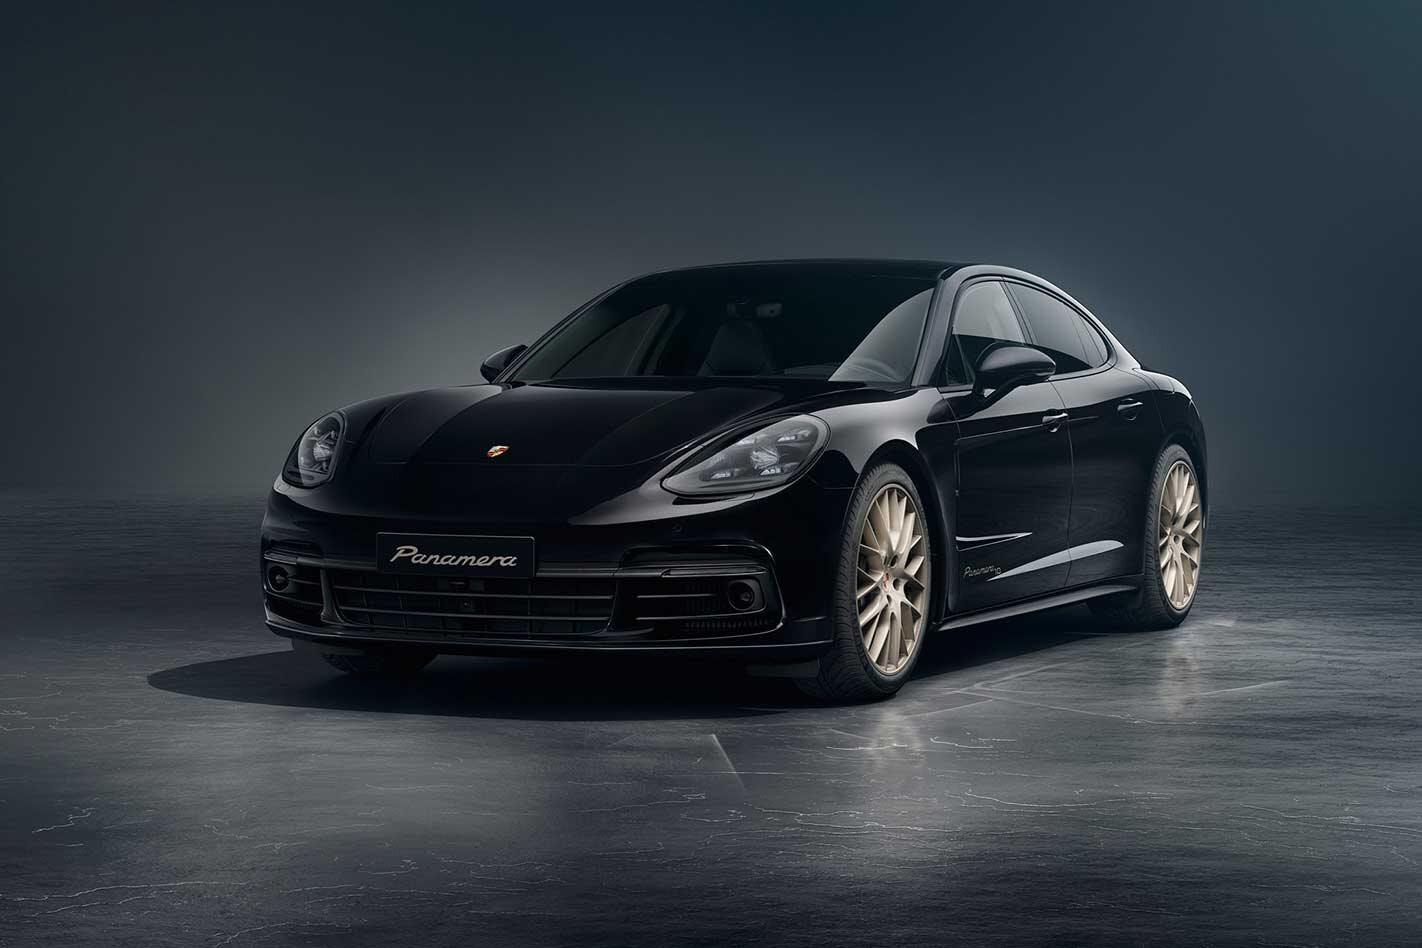 Porsche Panamera 10 Years Edition revealed